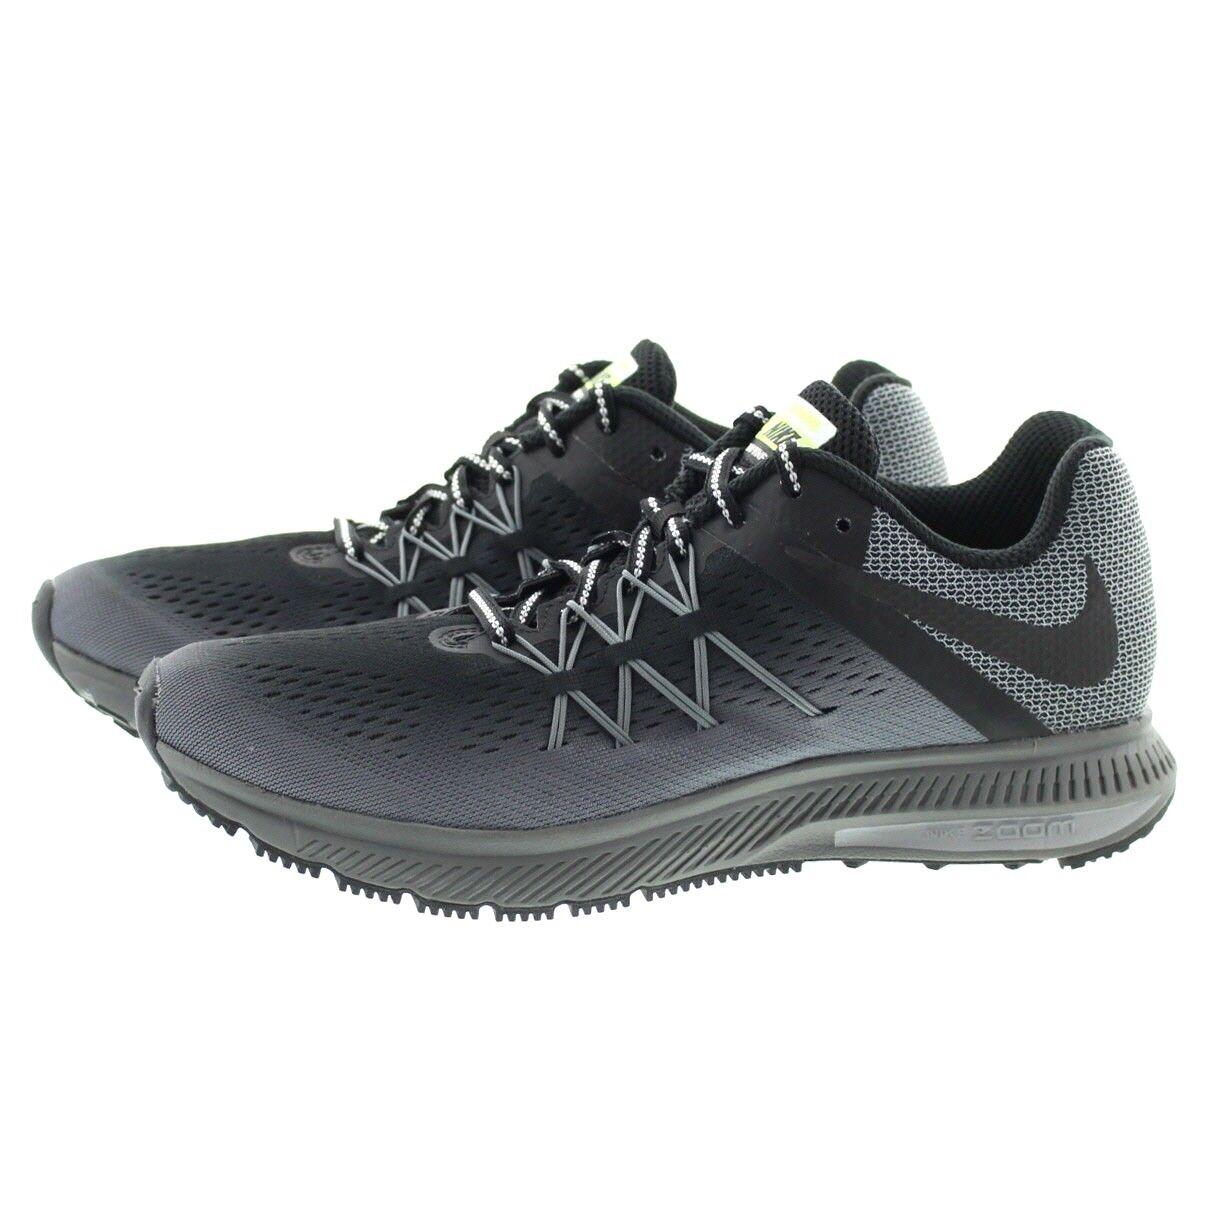 Nike 852441 001 Mens Air Zoom Winflo 3 Water Resistant Running shoes Sneakers